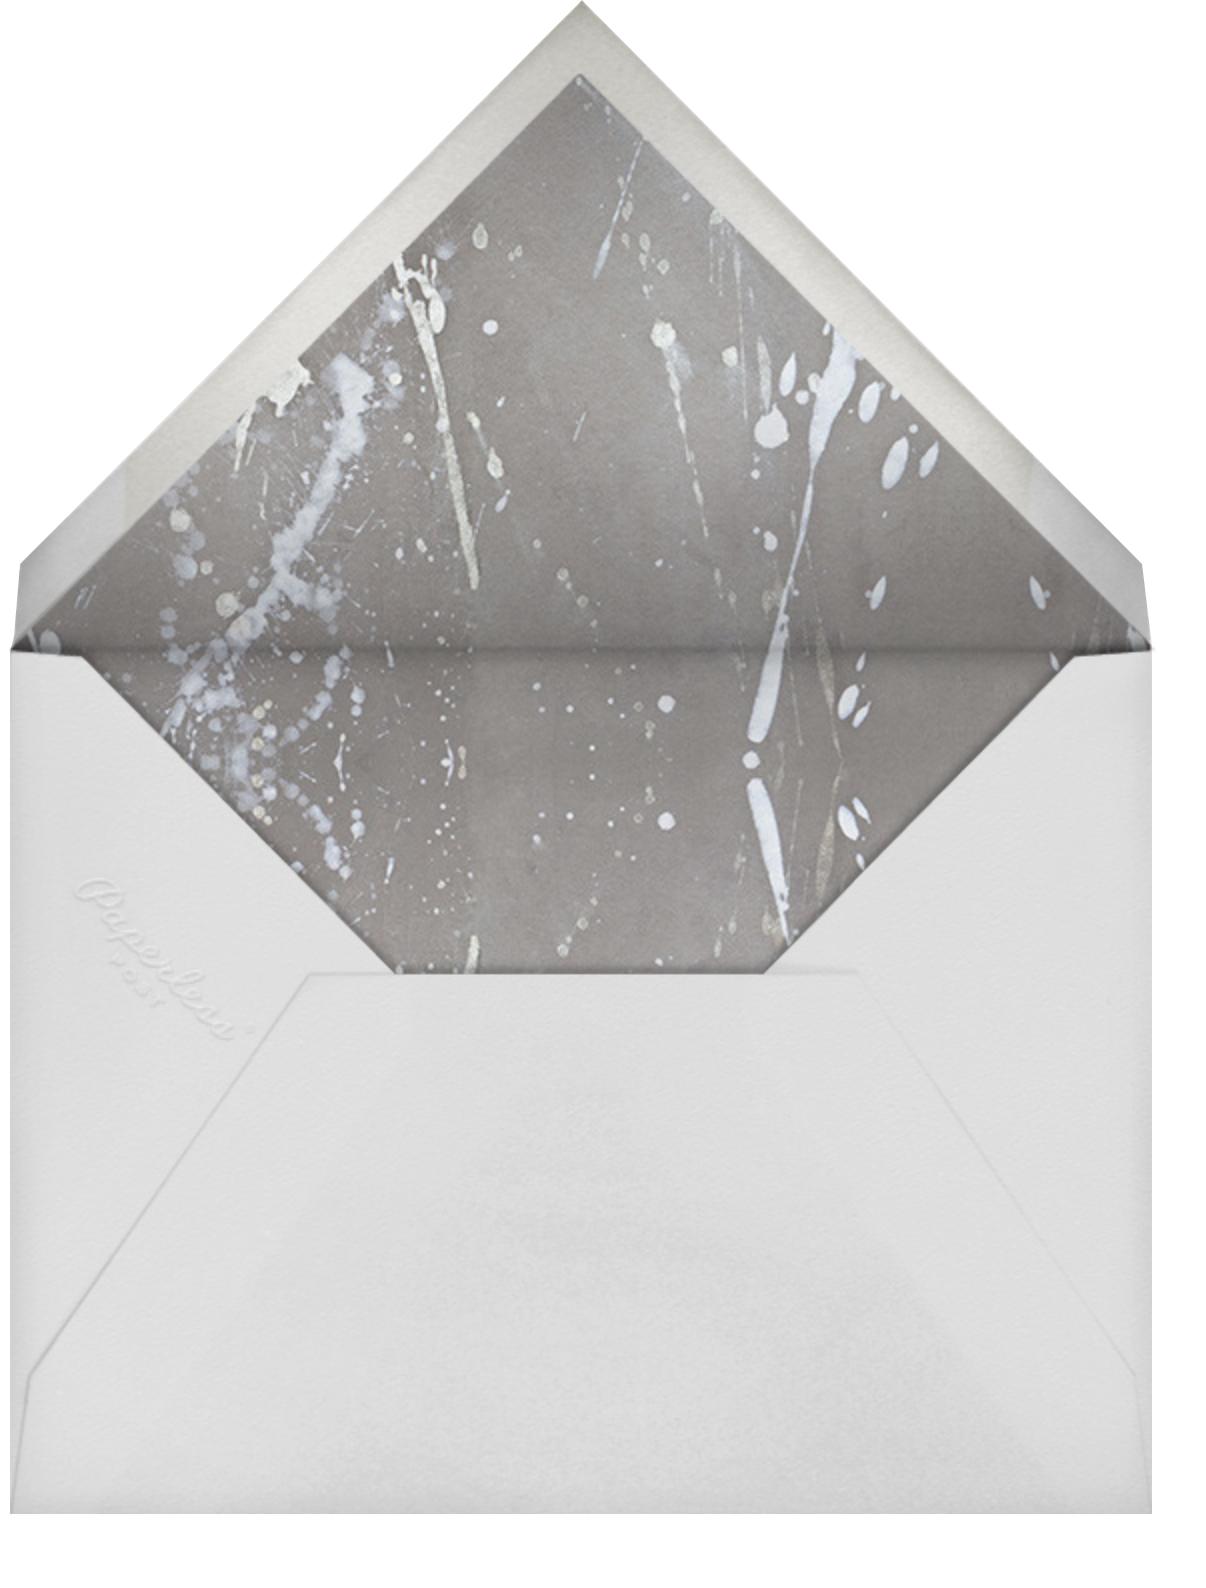 Graffito - Coral - Kelly Wearstler - Adult birthday - envelope back